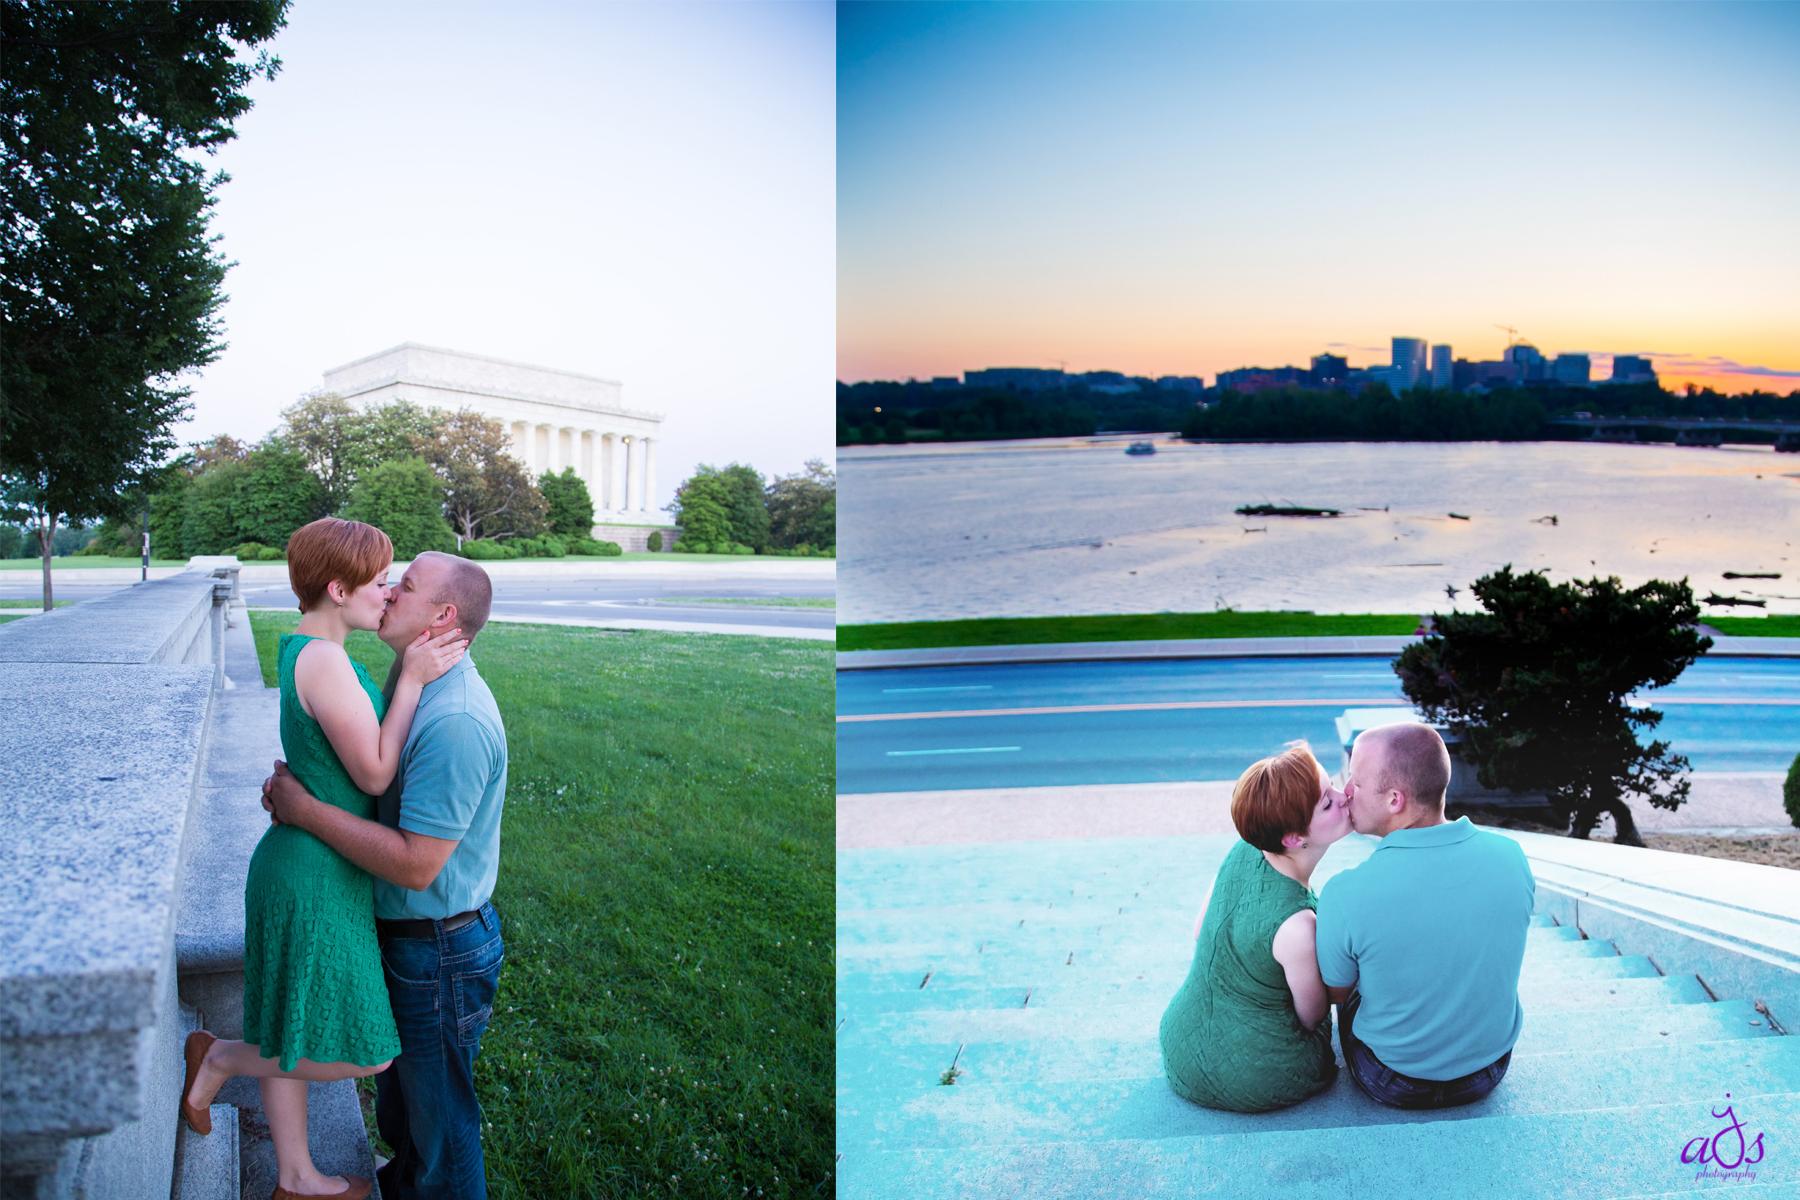 Washington Dc Honeymoon